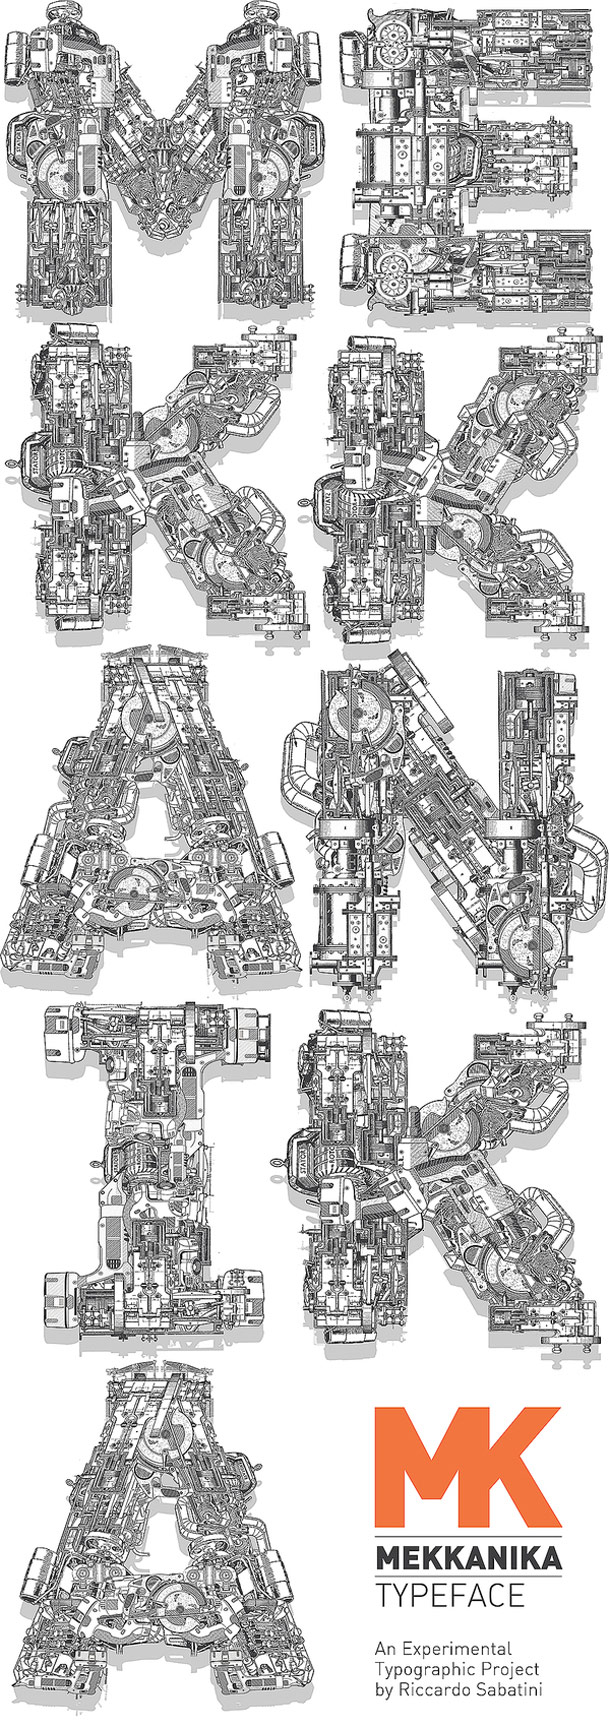 Mekkanika Typeface Font Design Inspiration